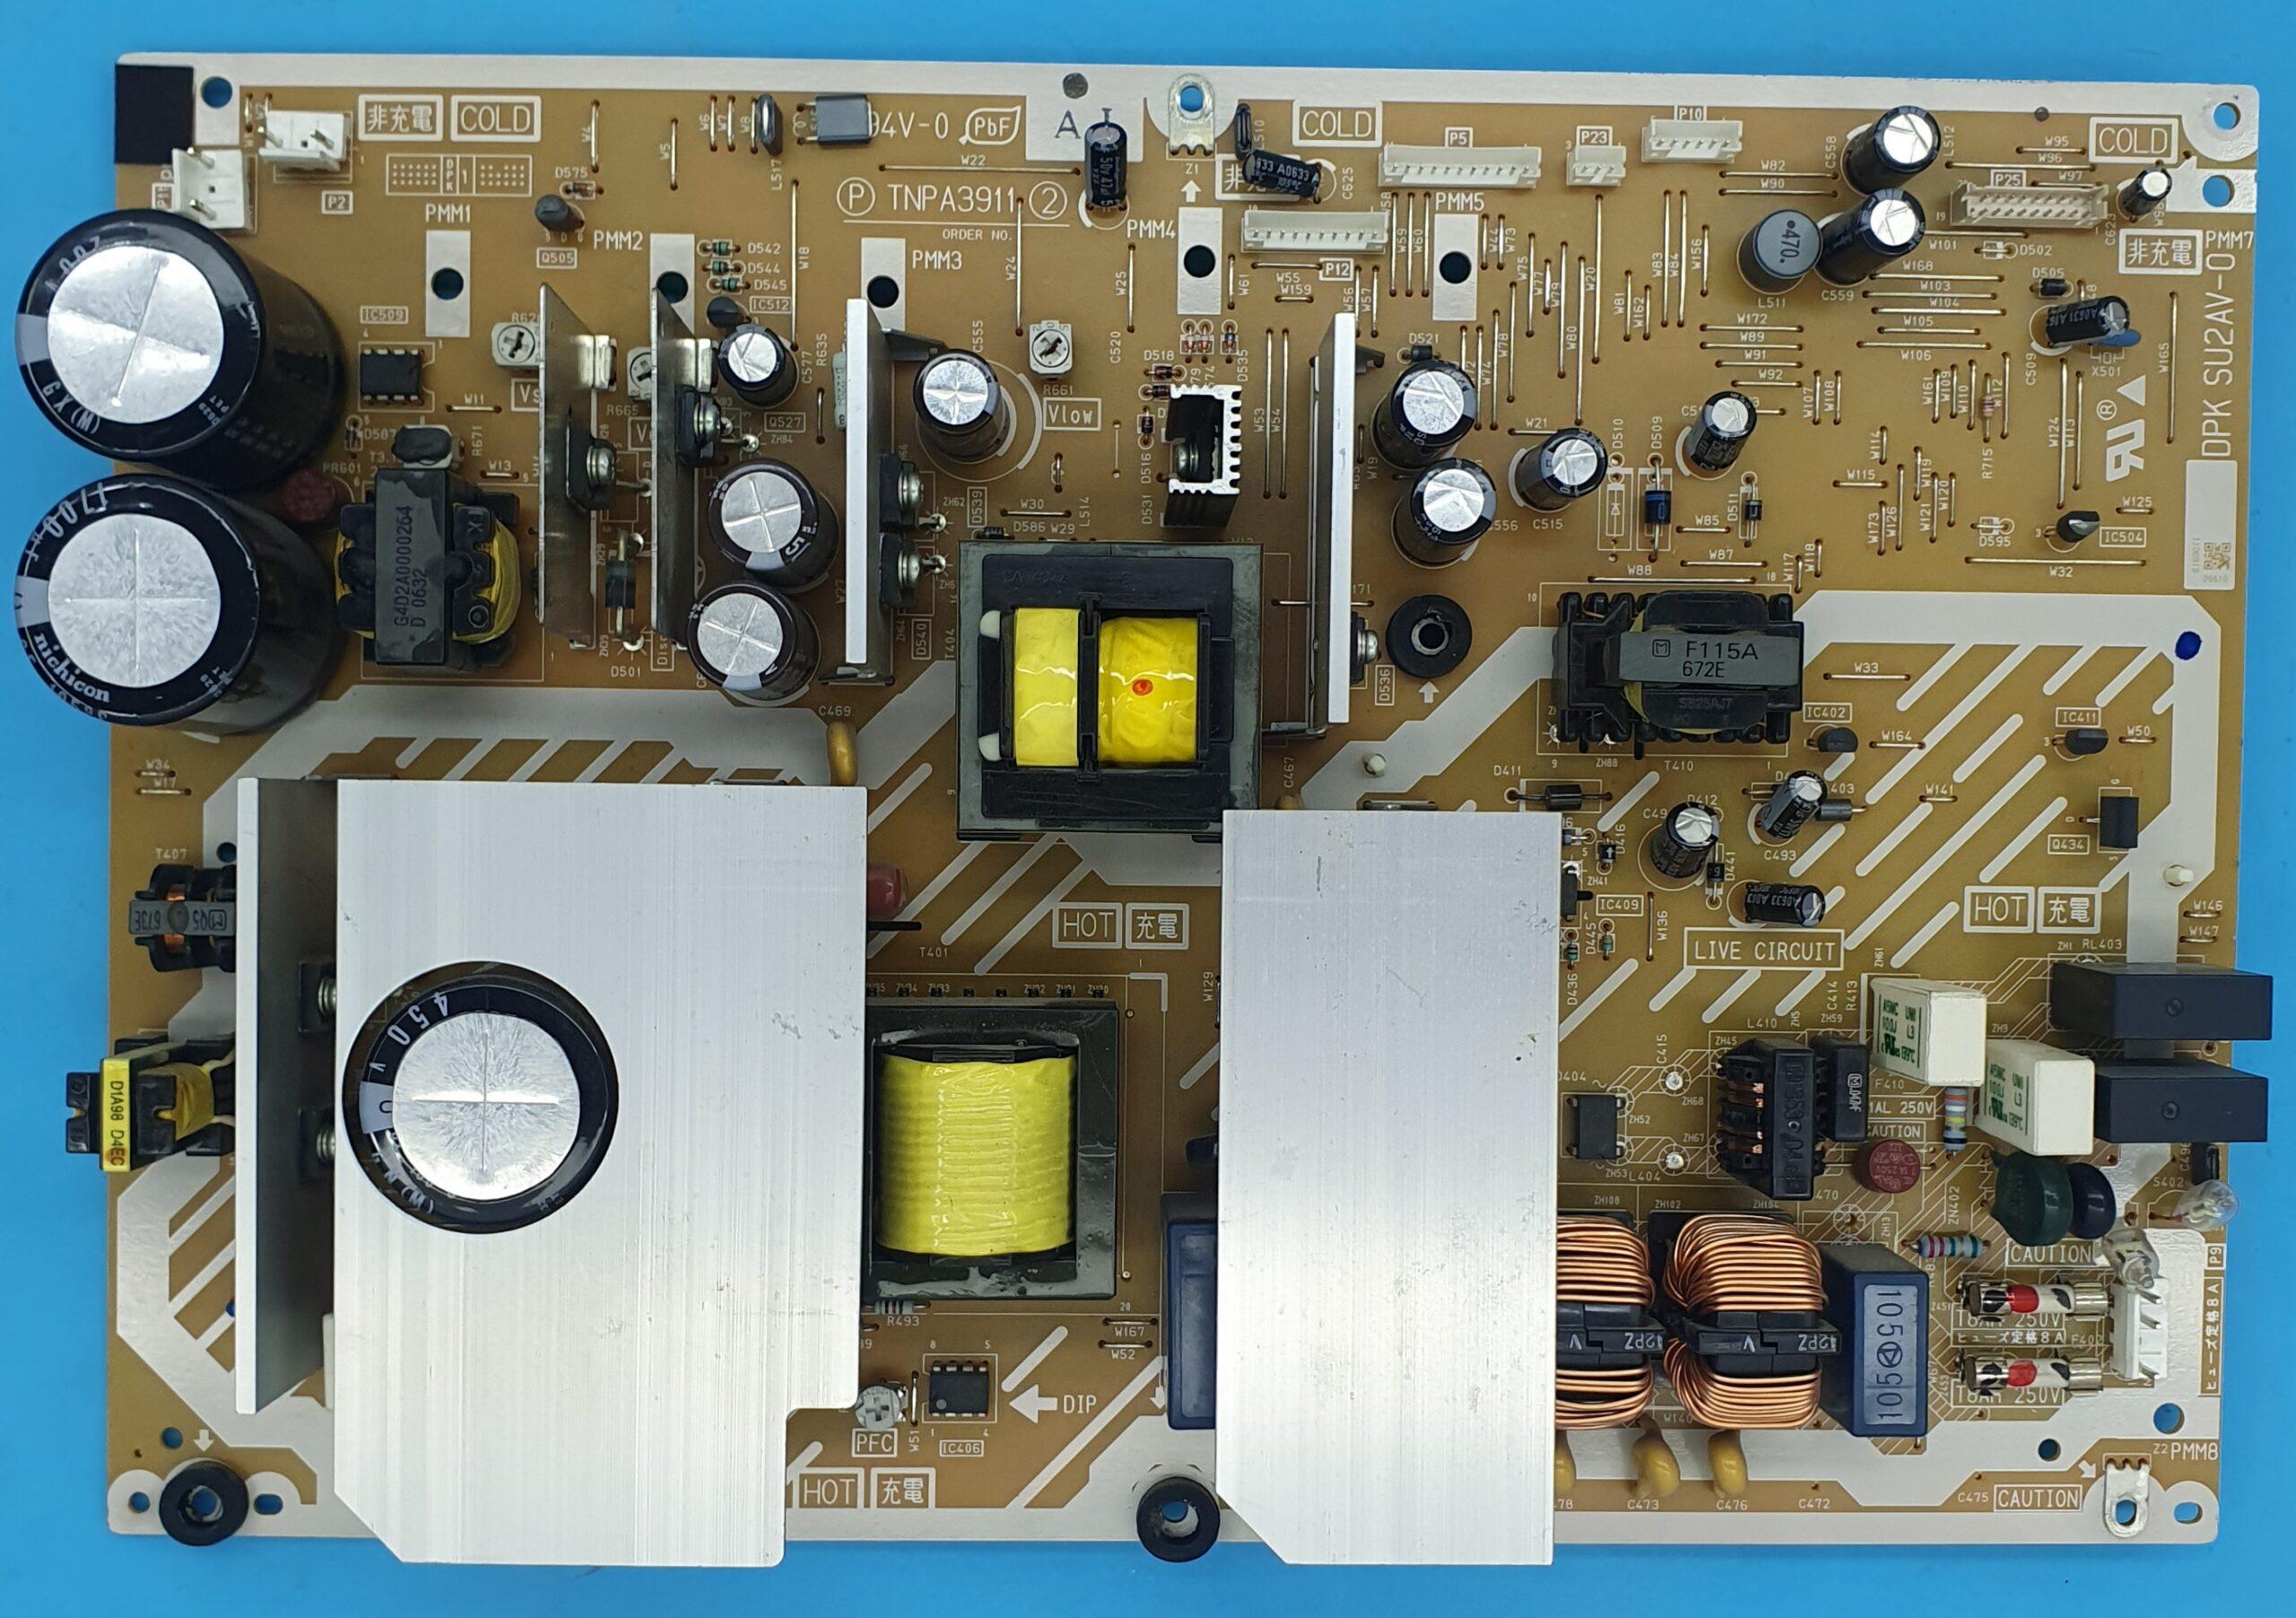 TNPA3911-2 Panasonic Power (KDV DAHİL = 150 TL)